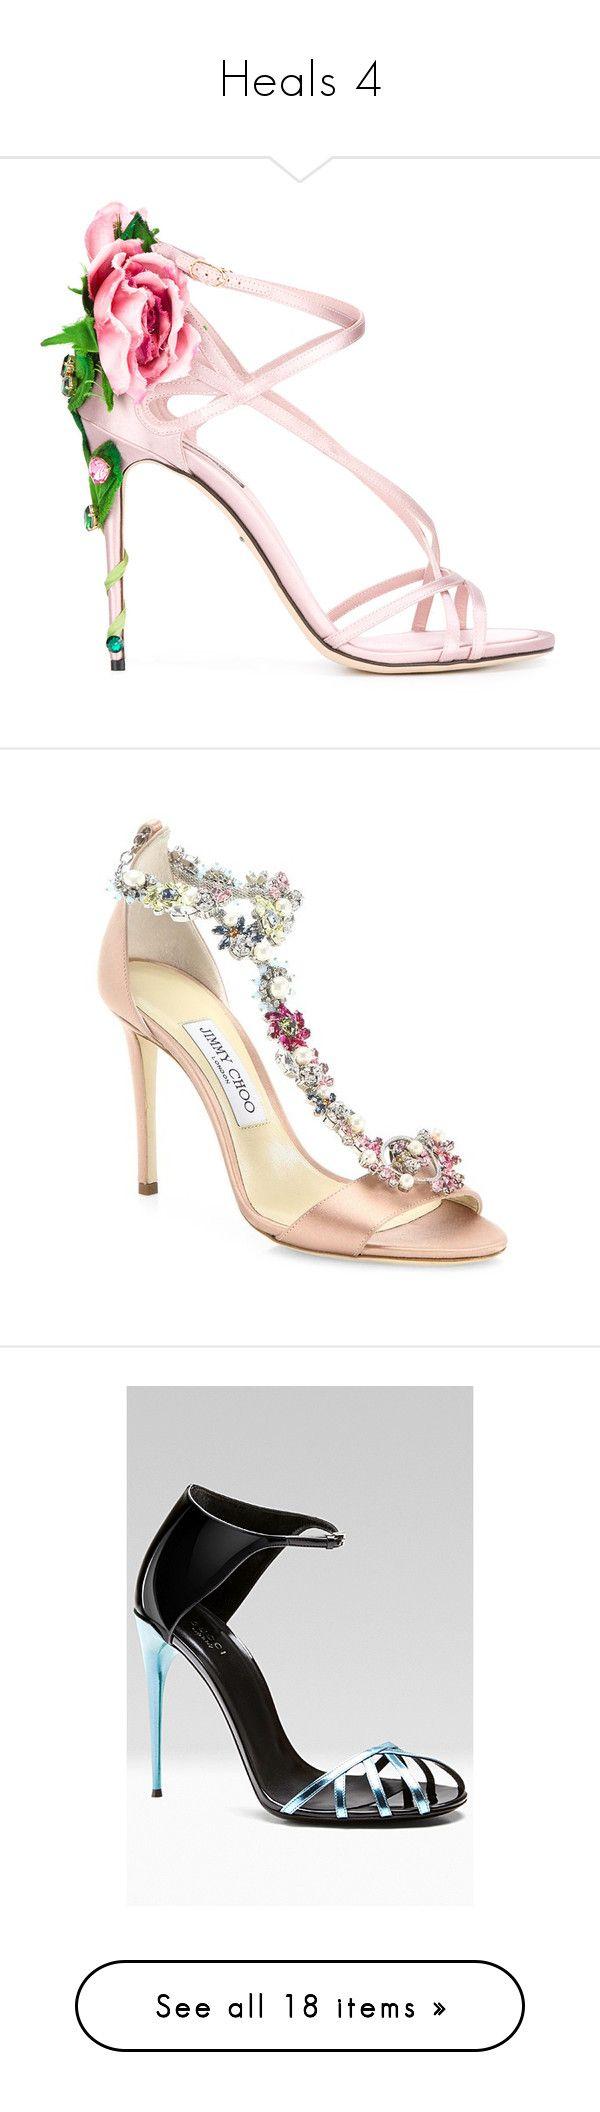 """Heals 4"" by thesassystewart on Polyvore featuring shoes, sandals, heels, high heel stilettos, pink stilettos, ankle strap heel sandals, floral shoes, pink heeled shoes, jimmy choo shoes and heeled sandals"